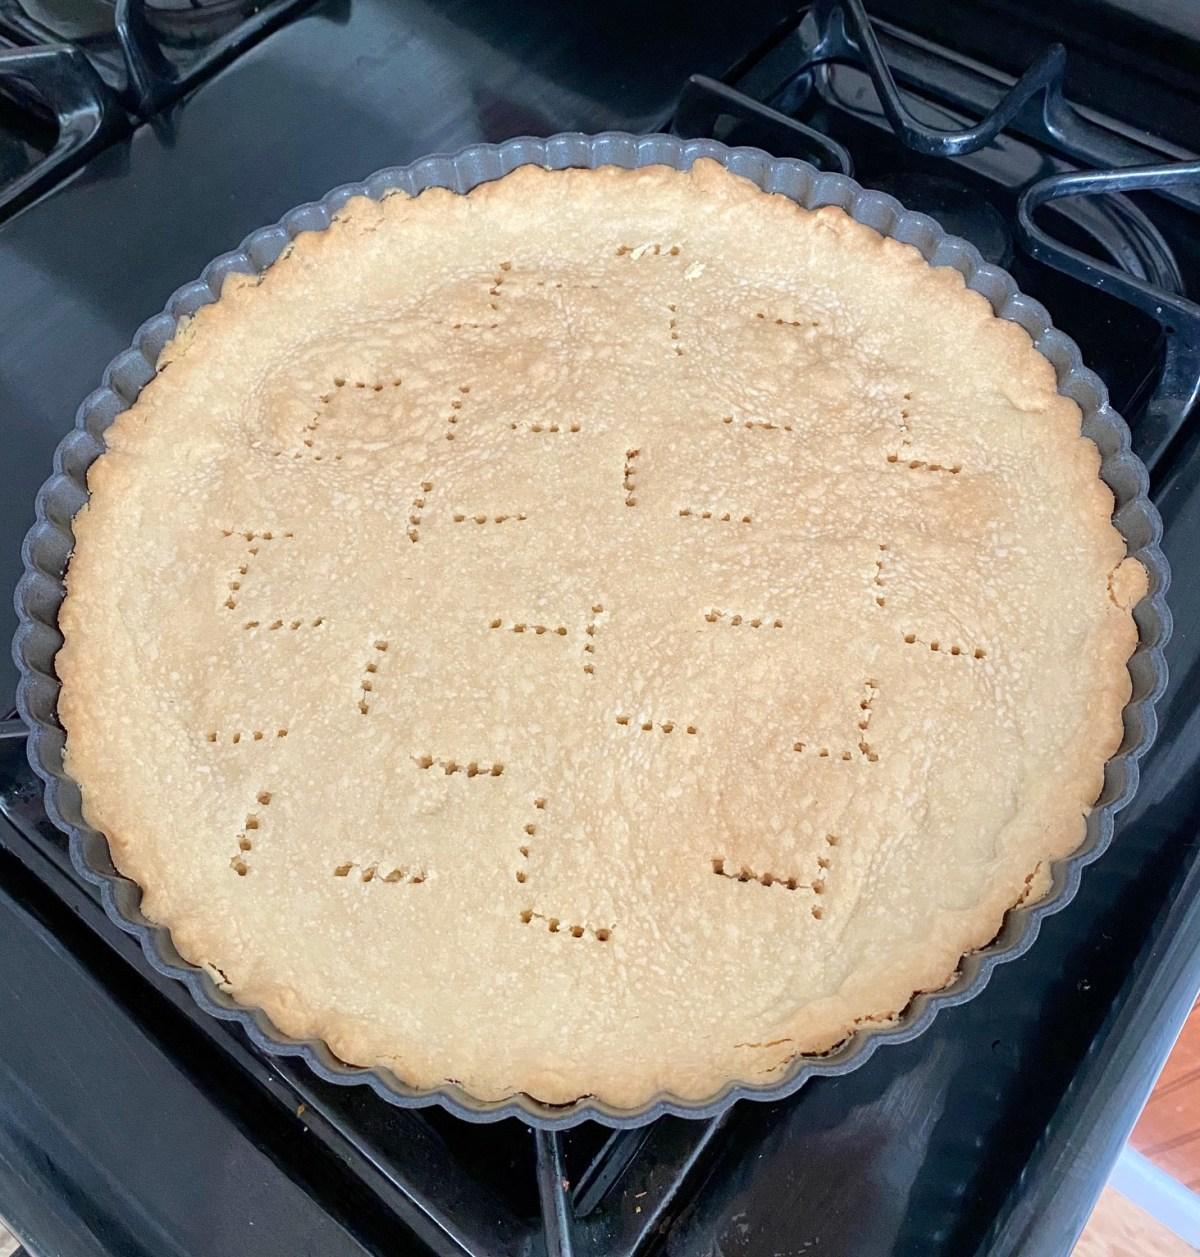 Tart crust baked in a tart pan cooling on the stovetop. #fruittart #whitechocolatedessert #dessert #fruitdessert #freshfruittart #brunchrecipes